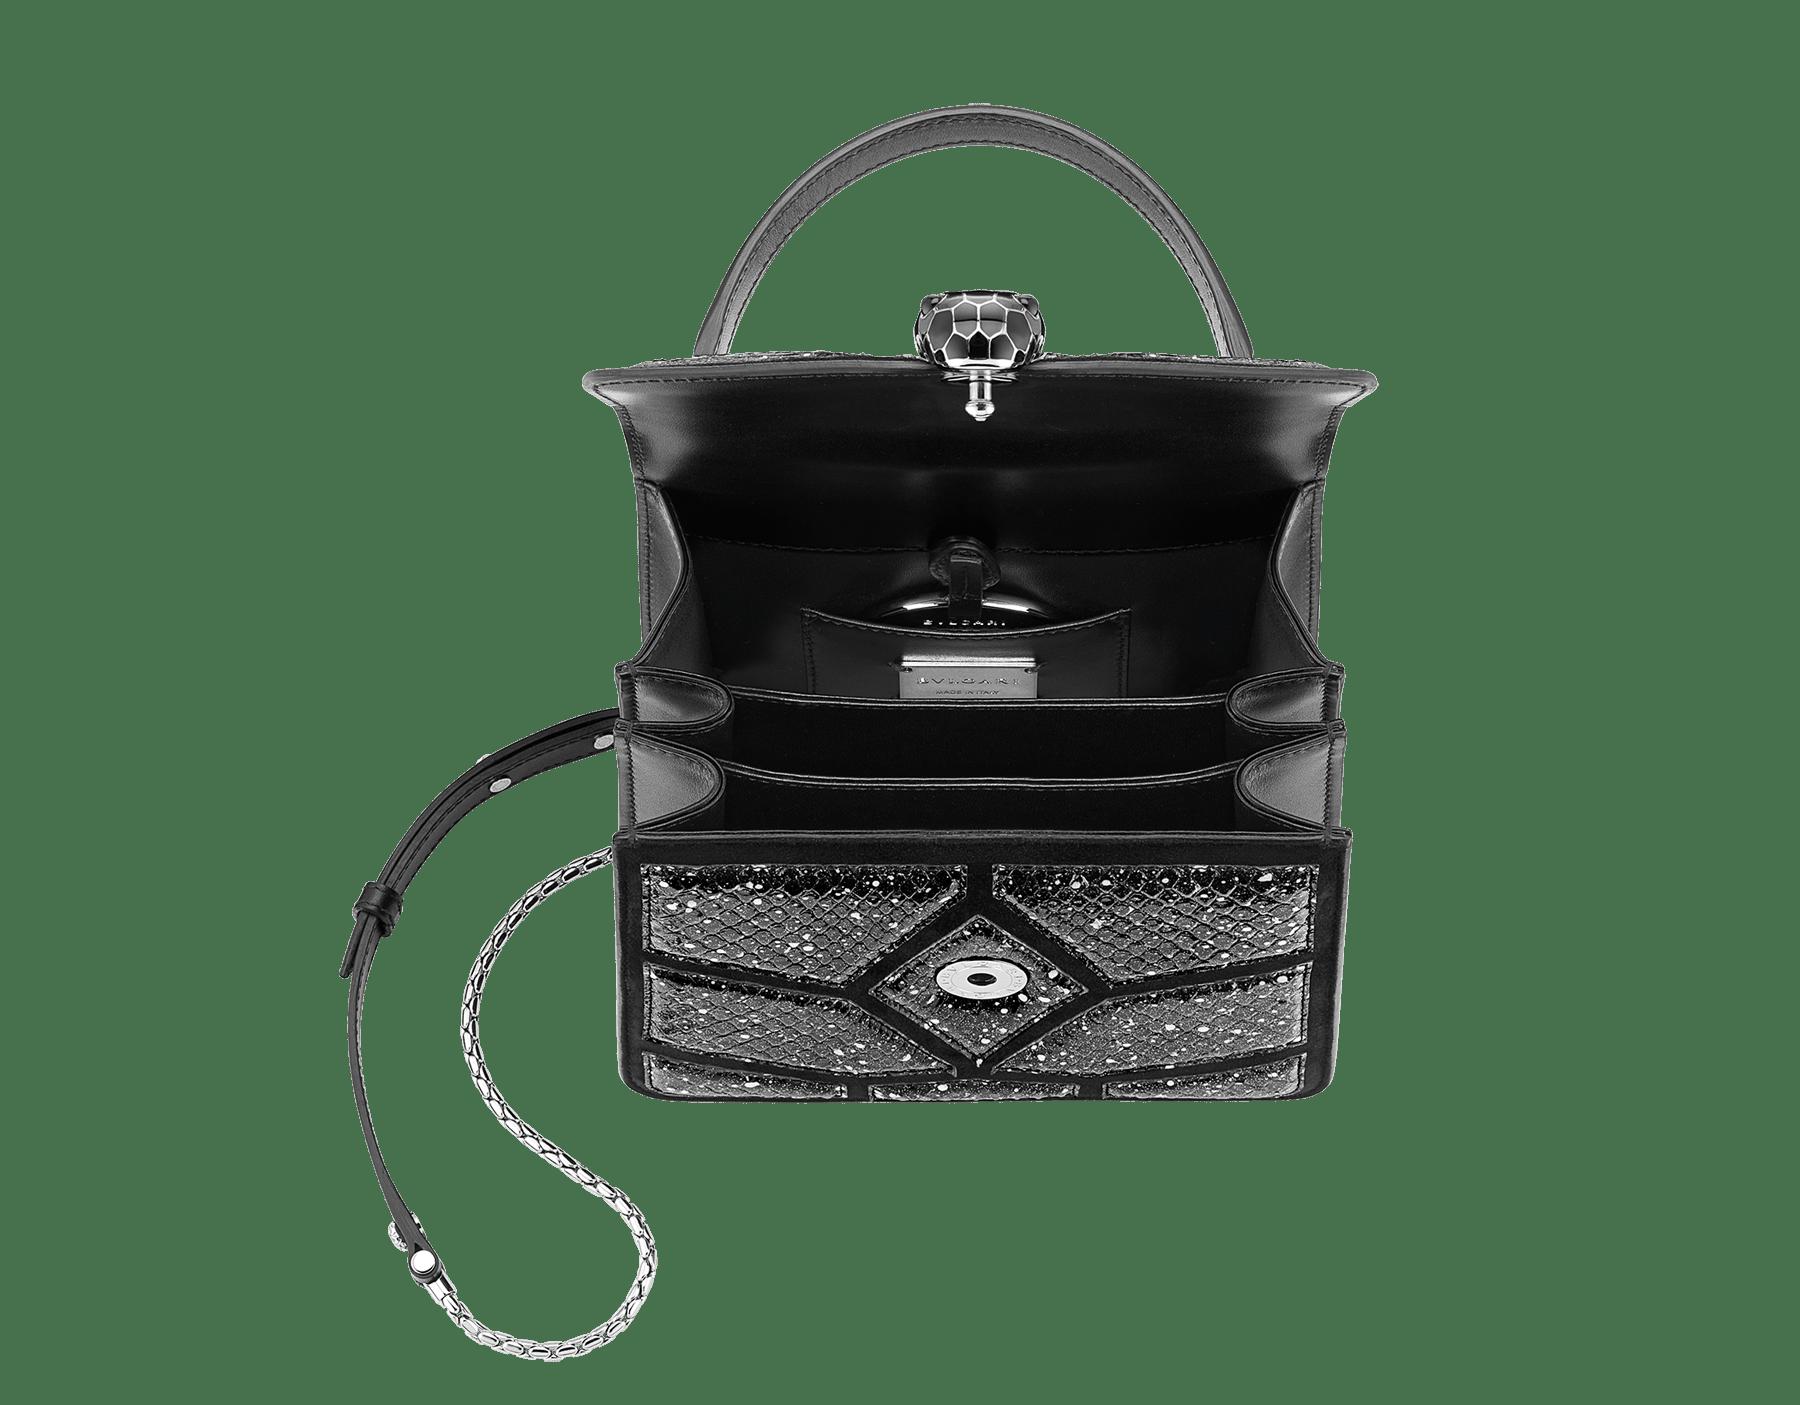 Serpenti Forever 斜背包採用黑色和白色「宇宙星塵」蟒皮和黑色小牛皮。鍍鈀黃銅蛇頭扣環飾以黑色琺瑯,蛇眼鑲飾黑色縞瑪瑙。 288223 image 4